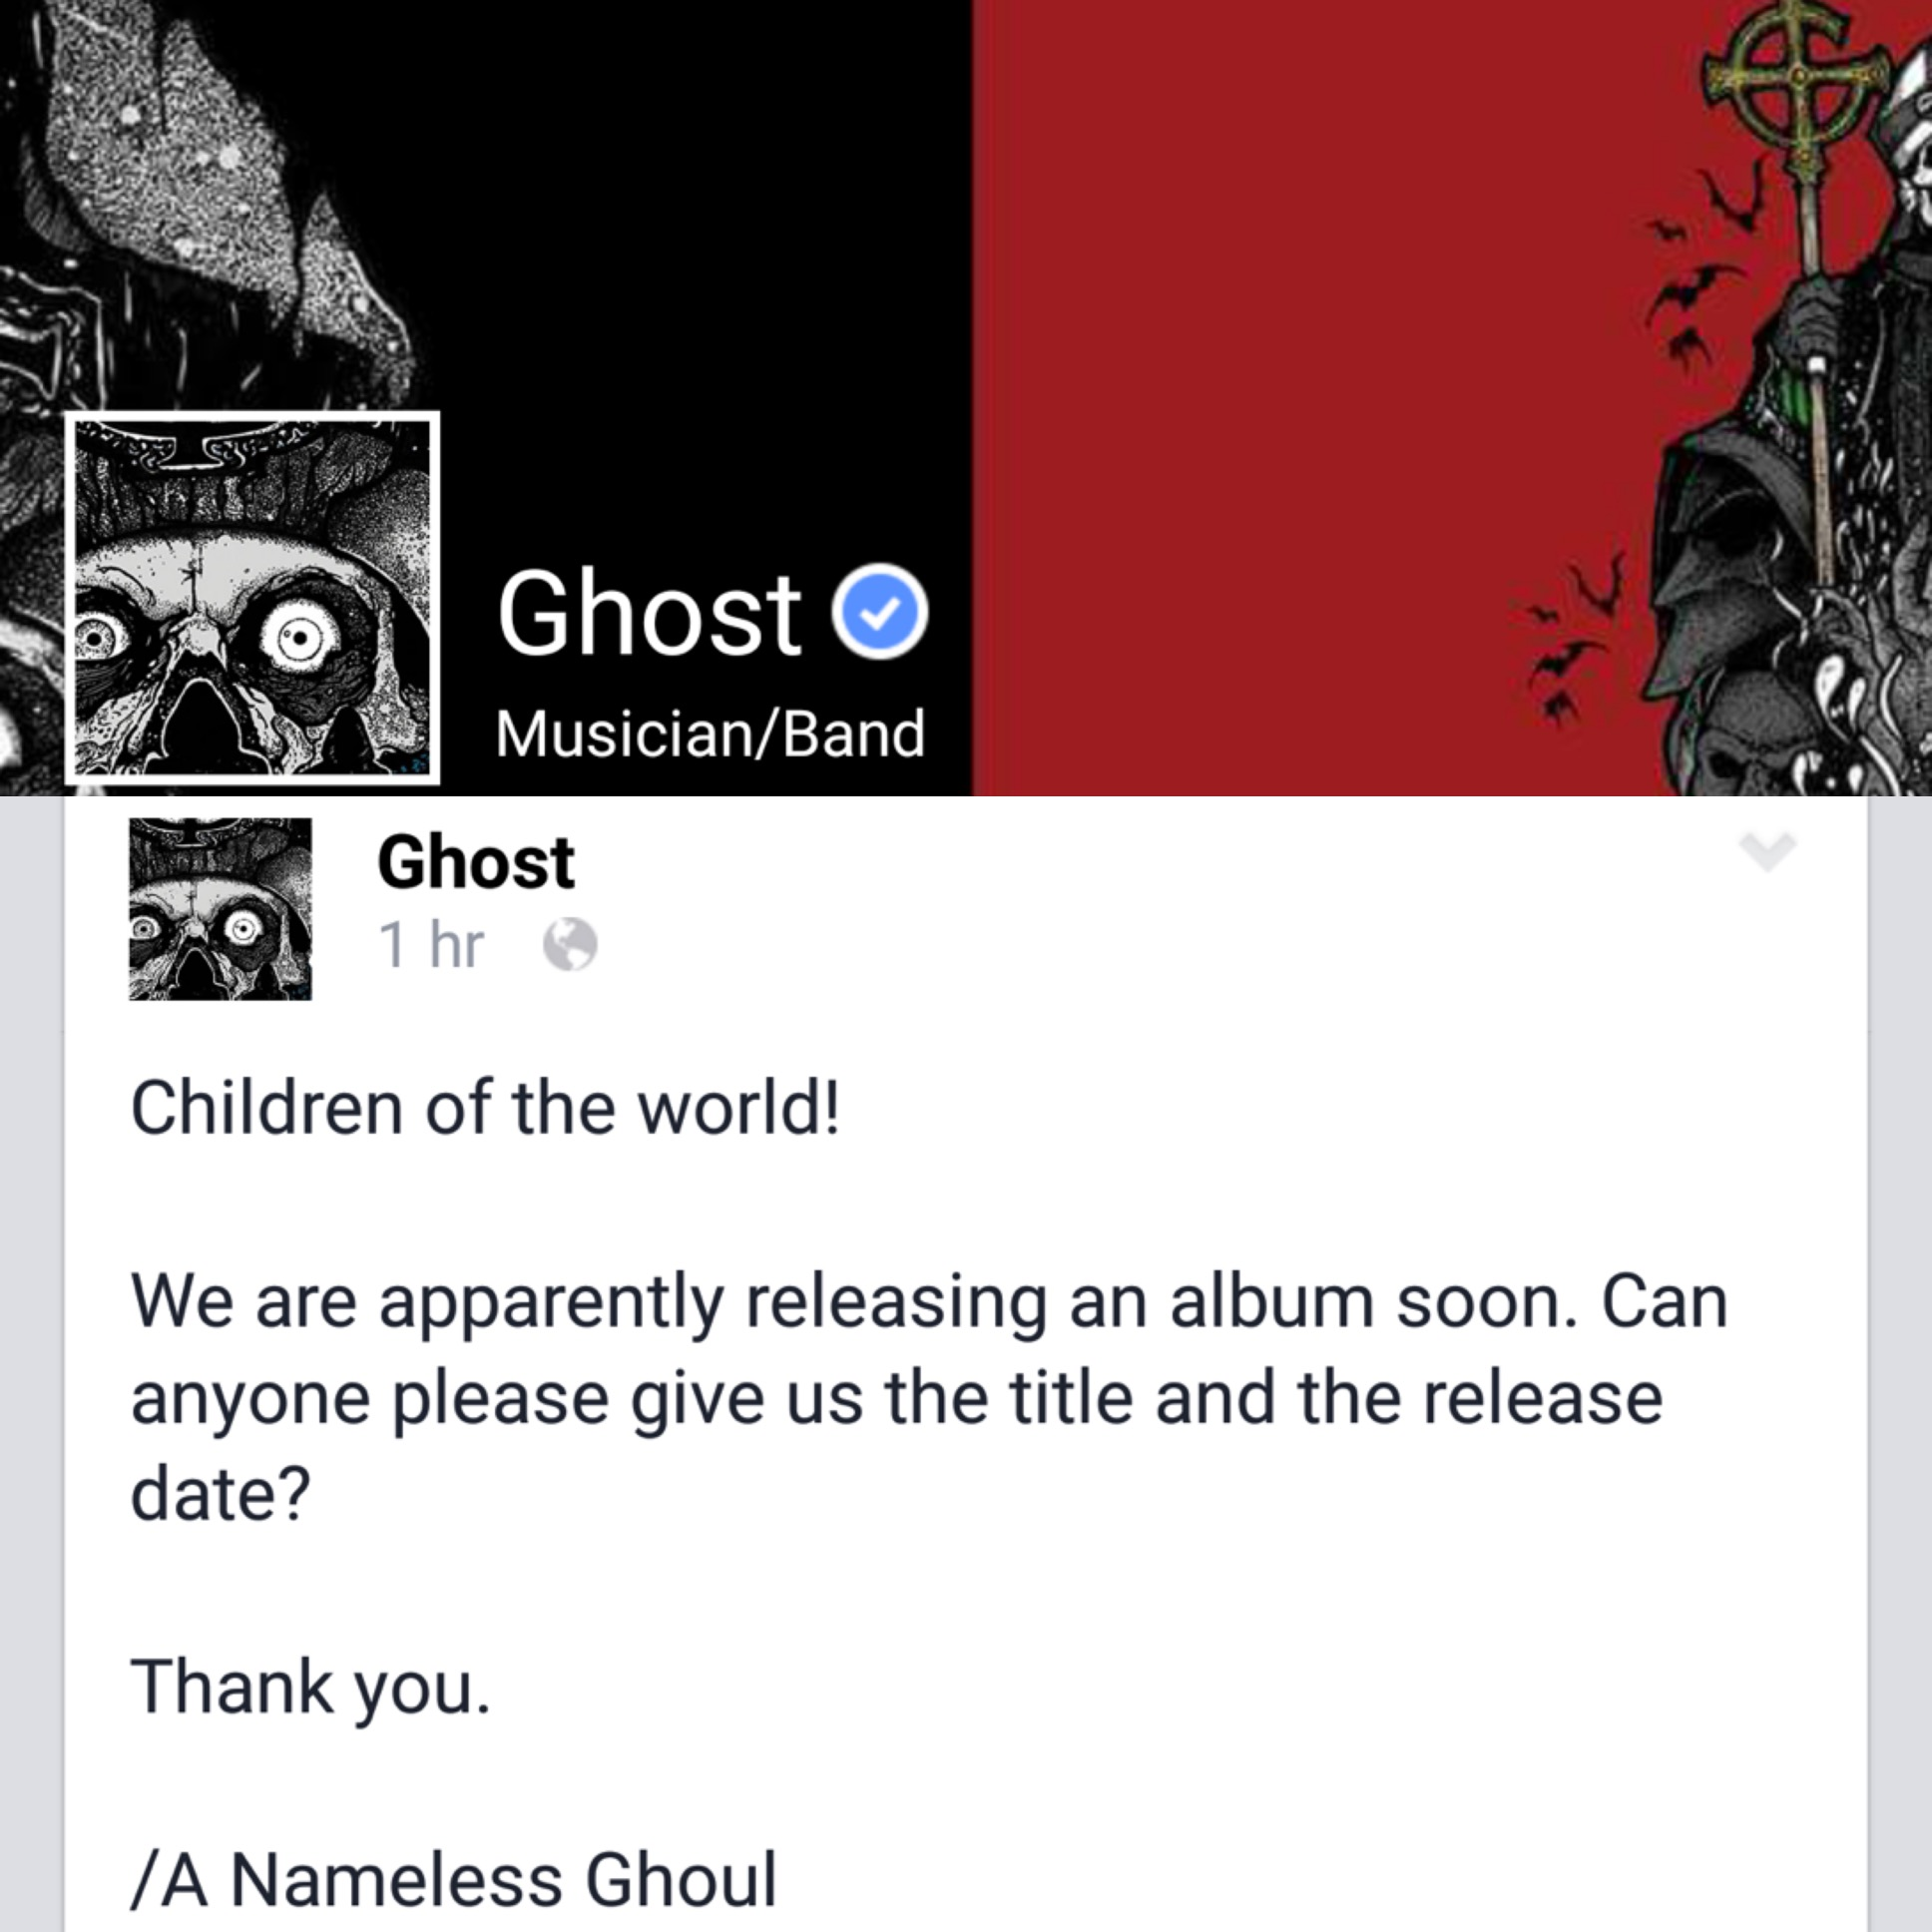 GhostFBPost51114